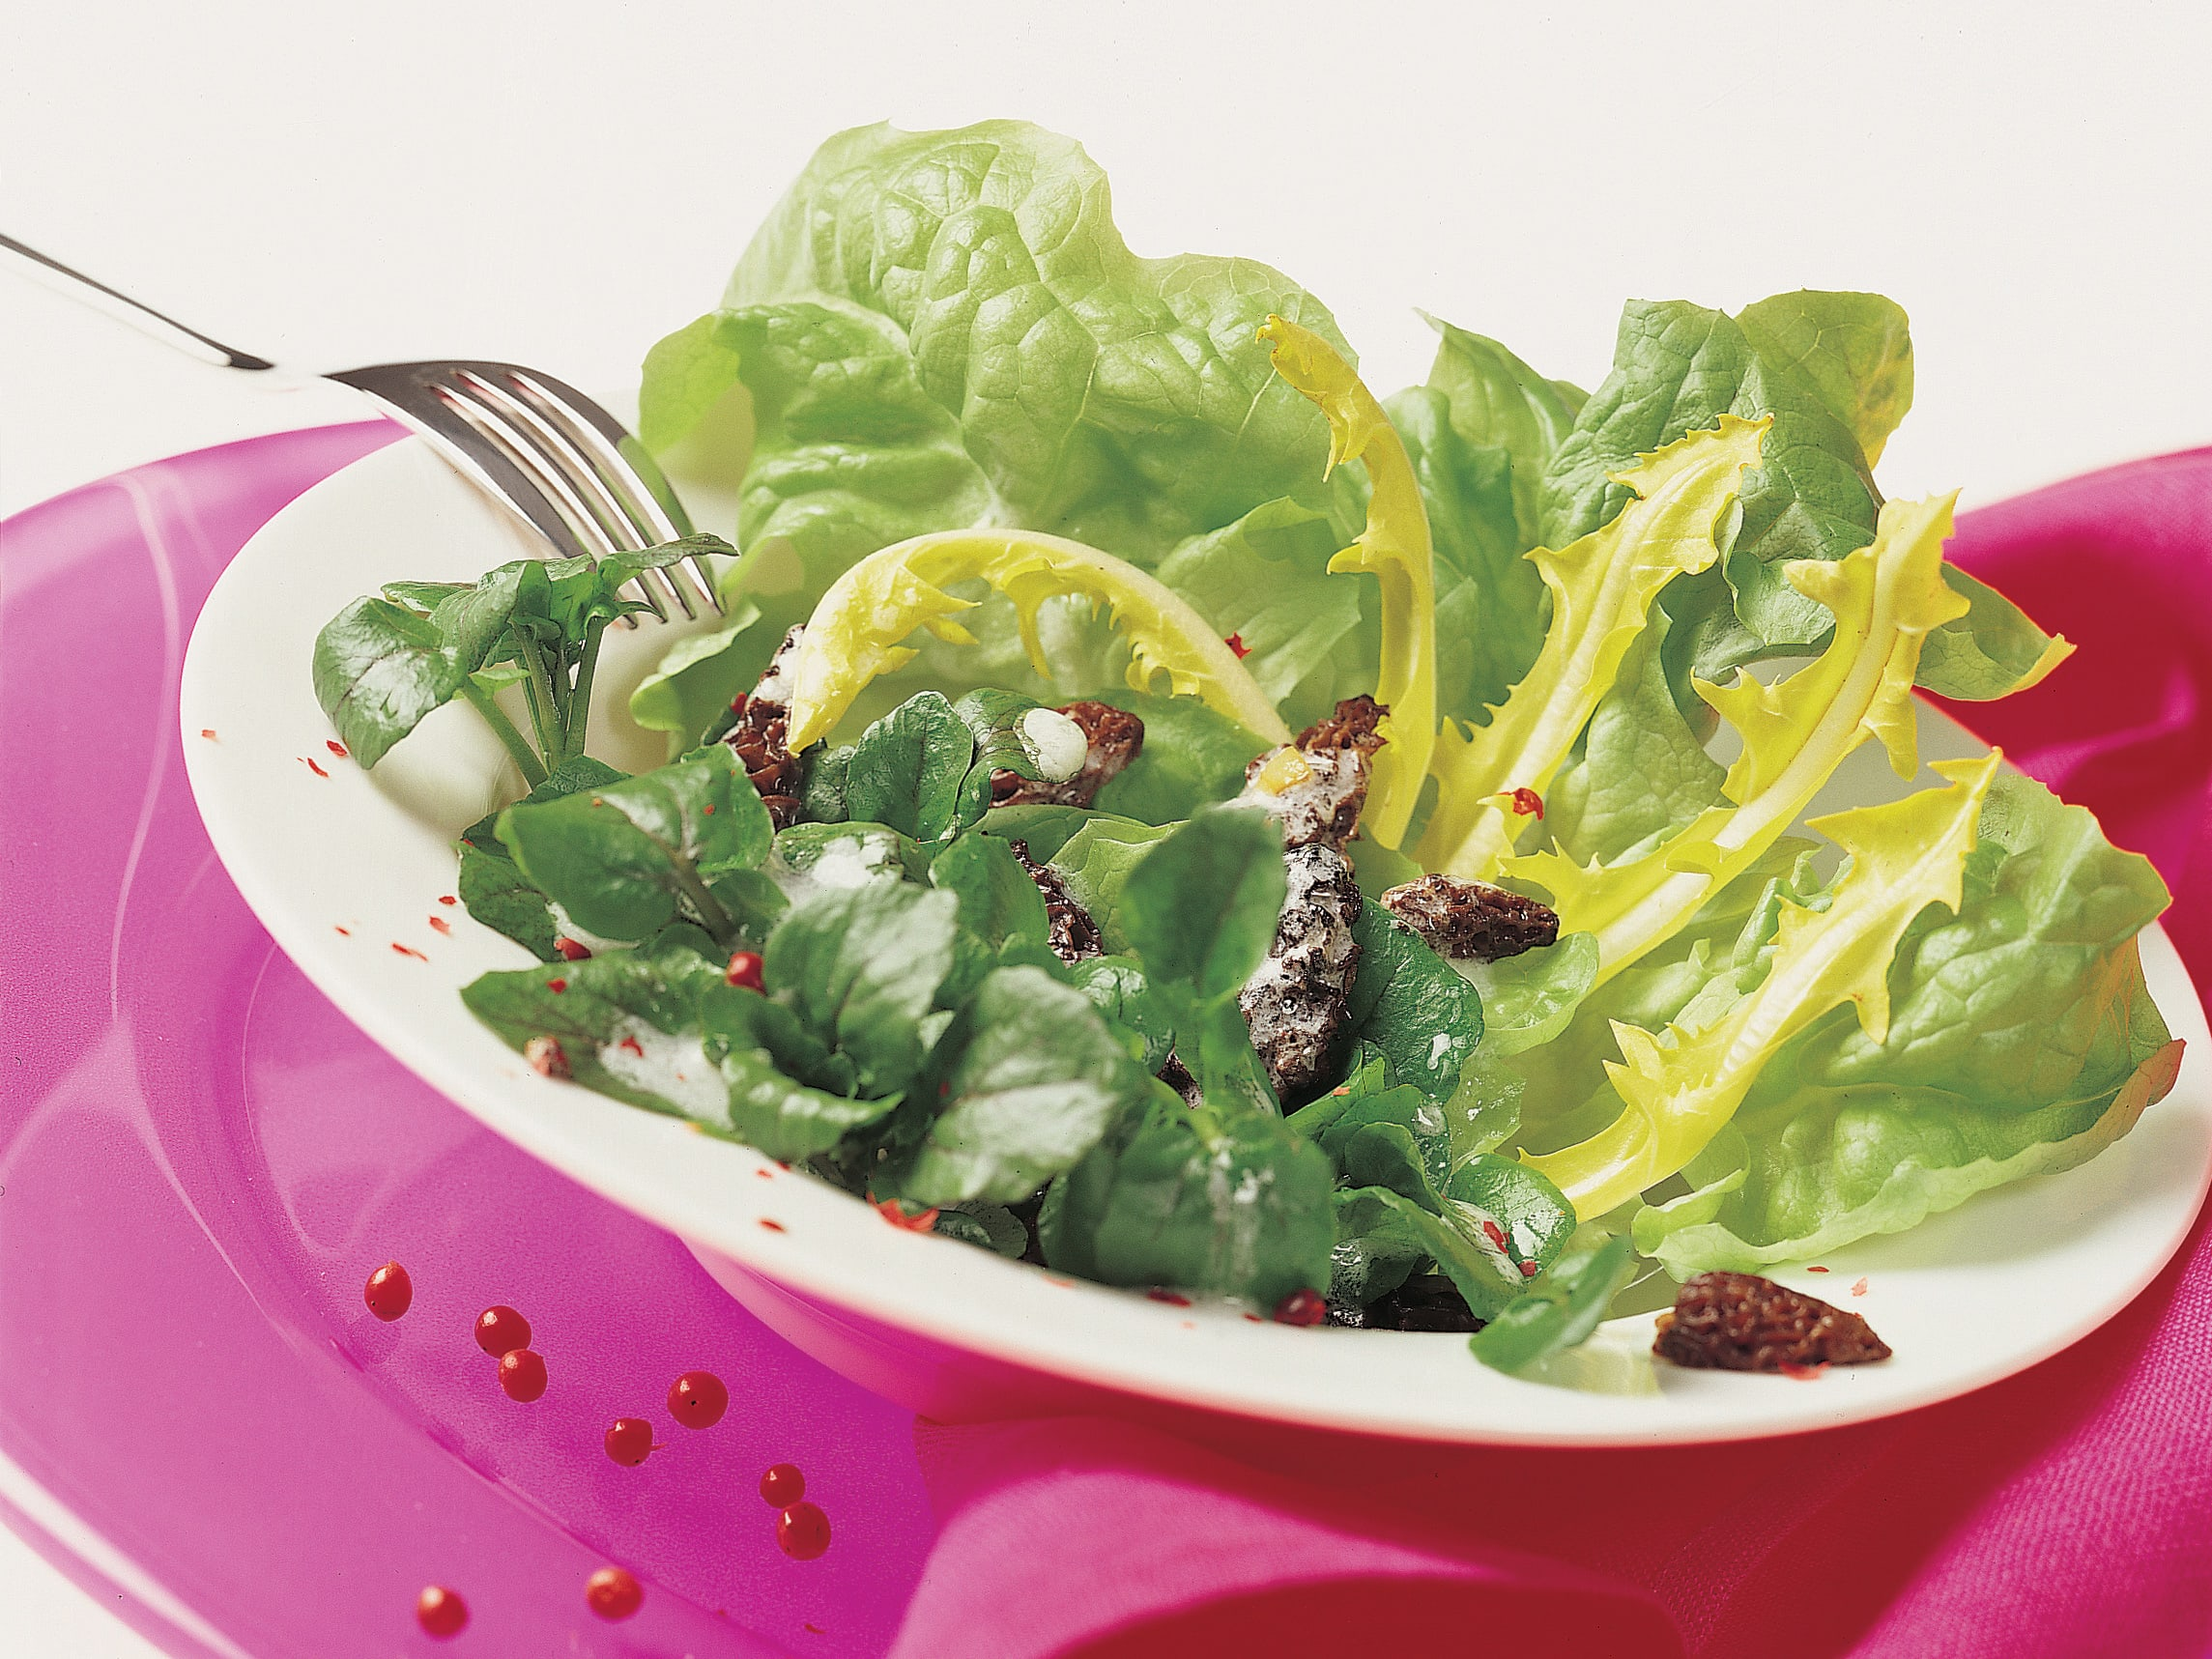 Schnittsalat mit Morcheln